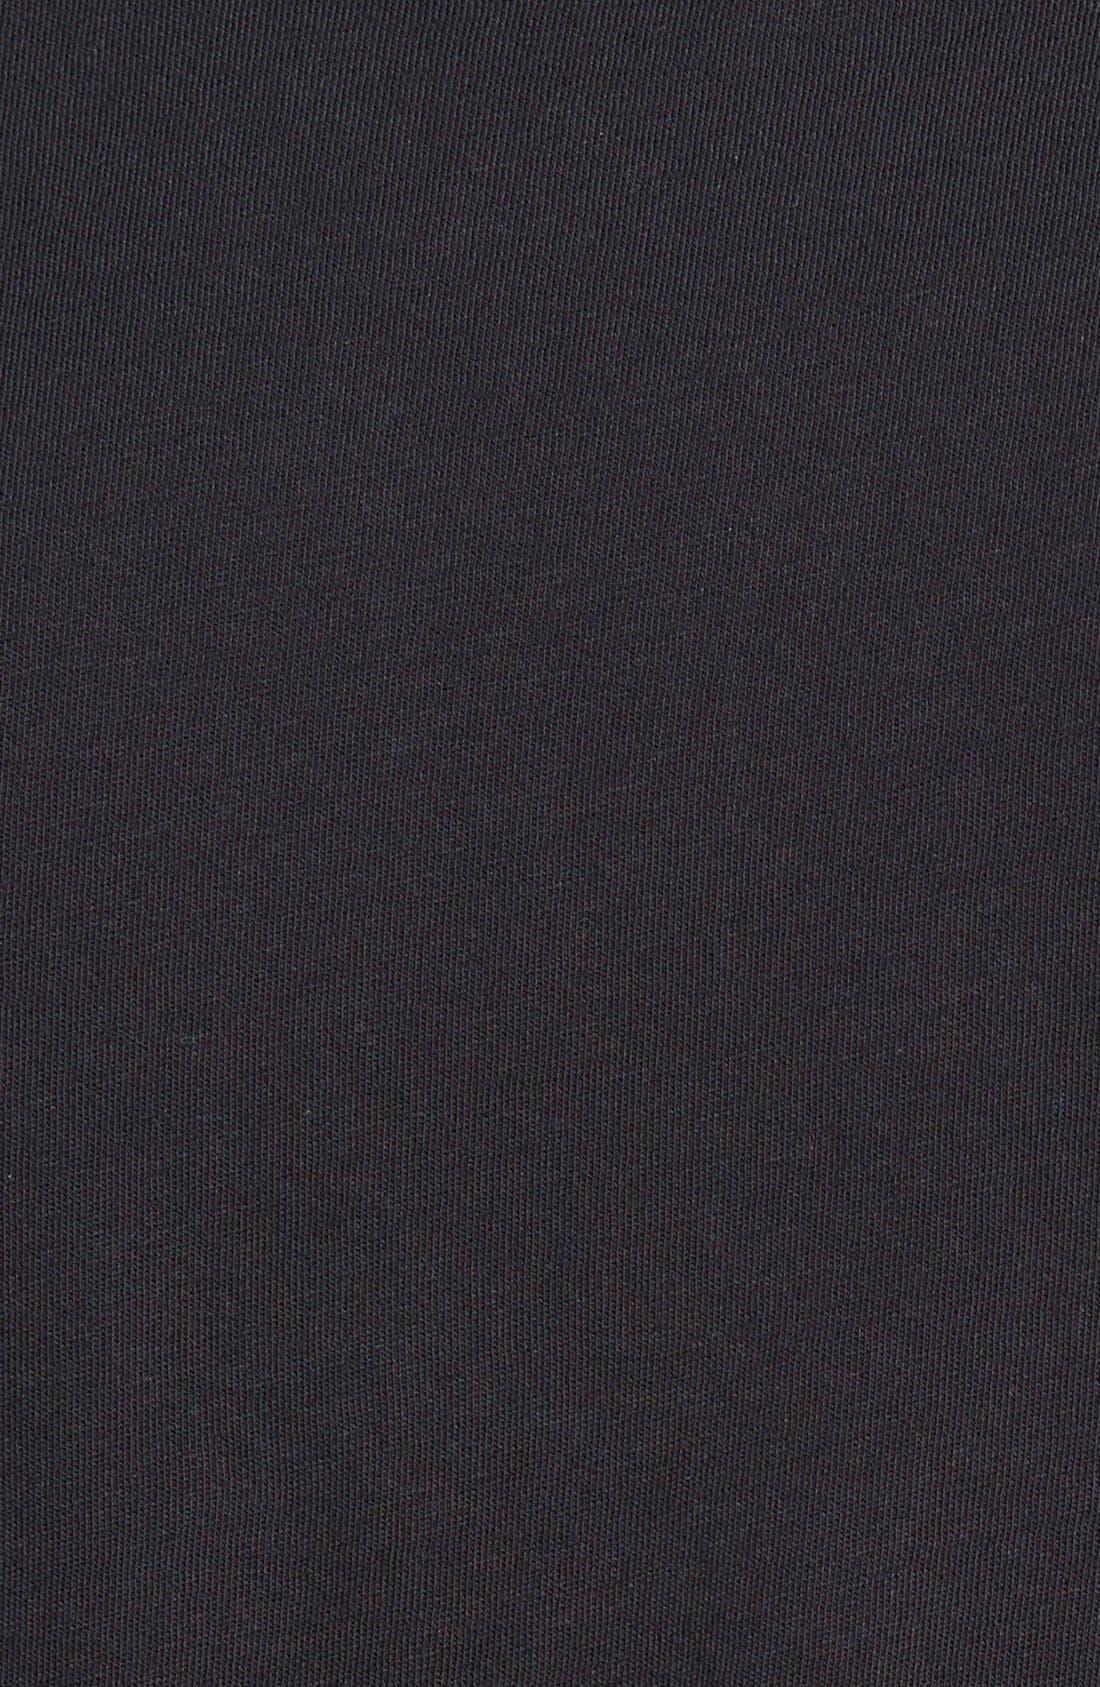 Pensacola Slim Fit Polo,                             Alternate thumbnail 5, color,                             001